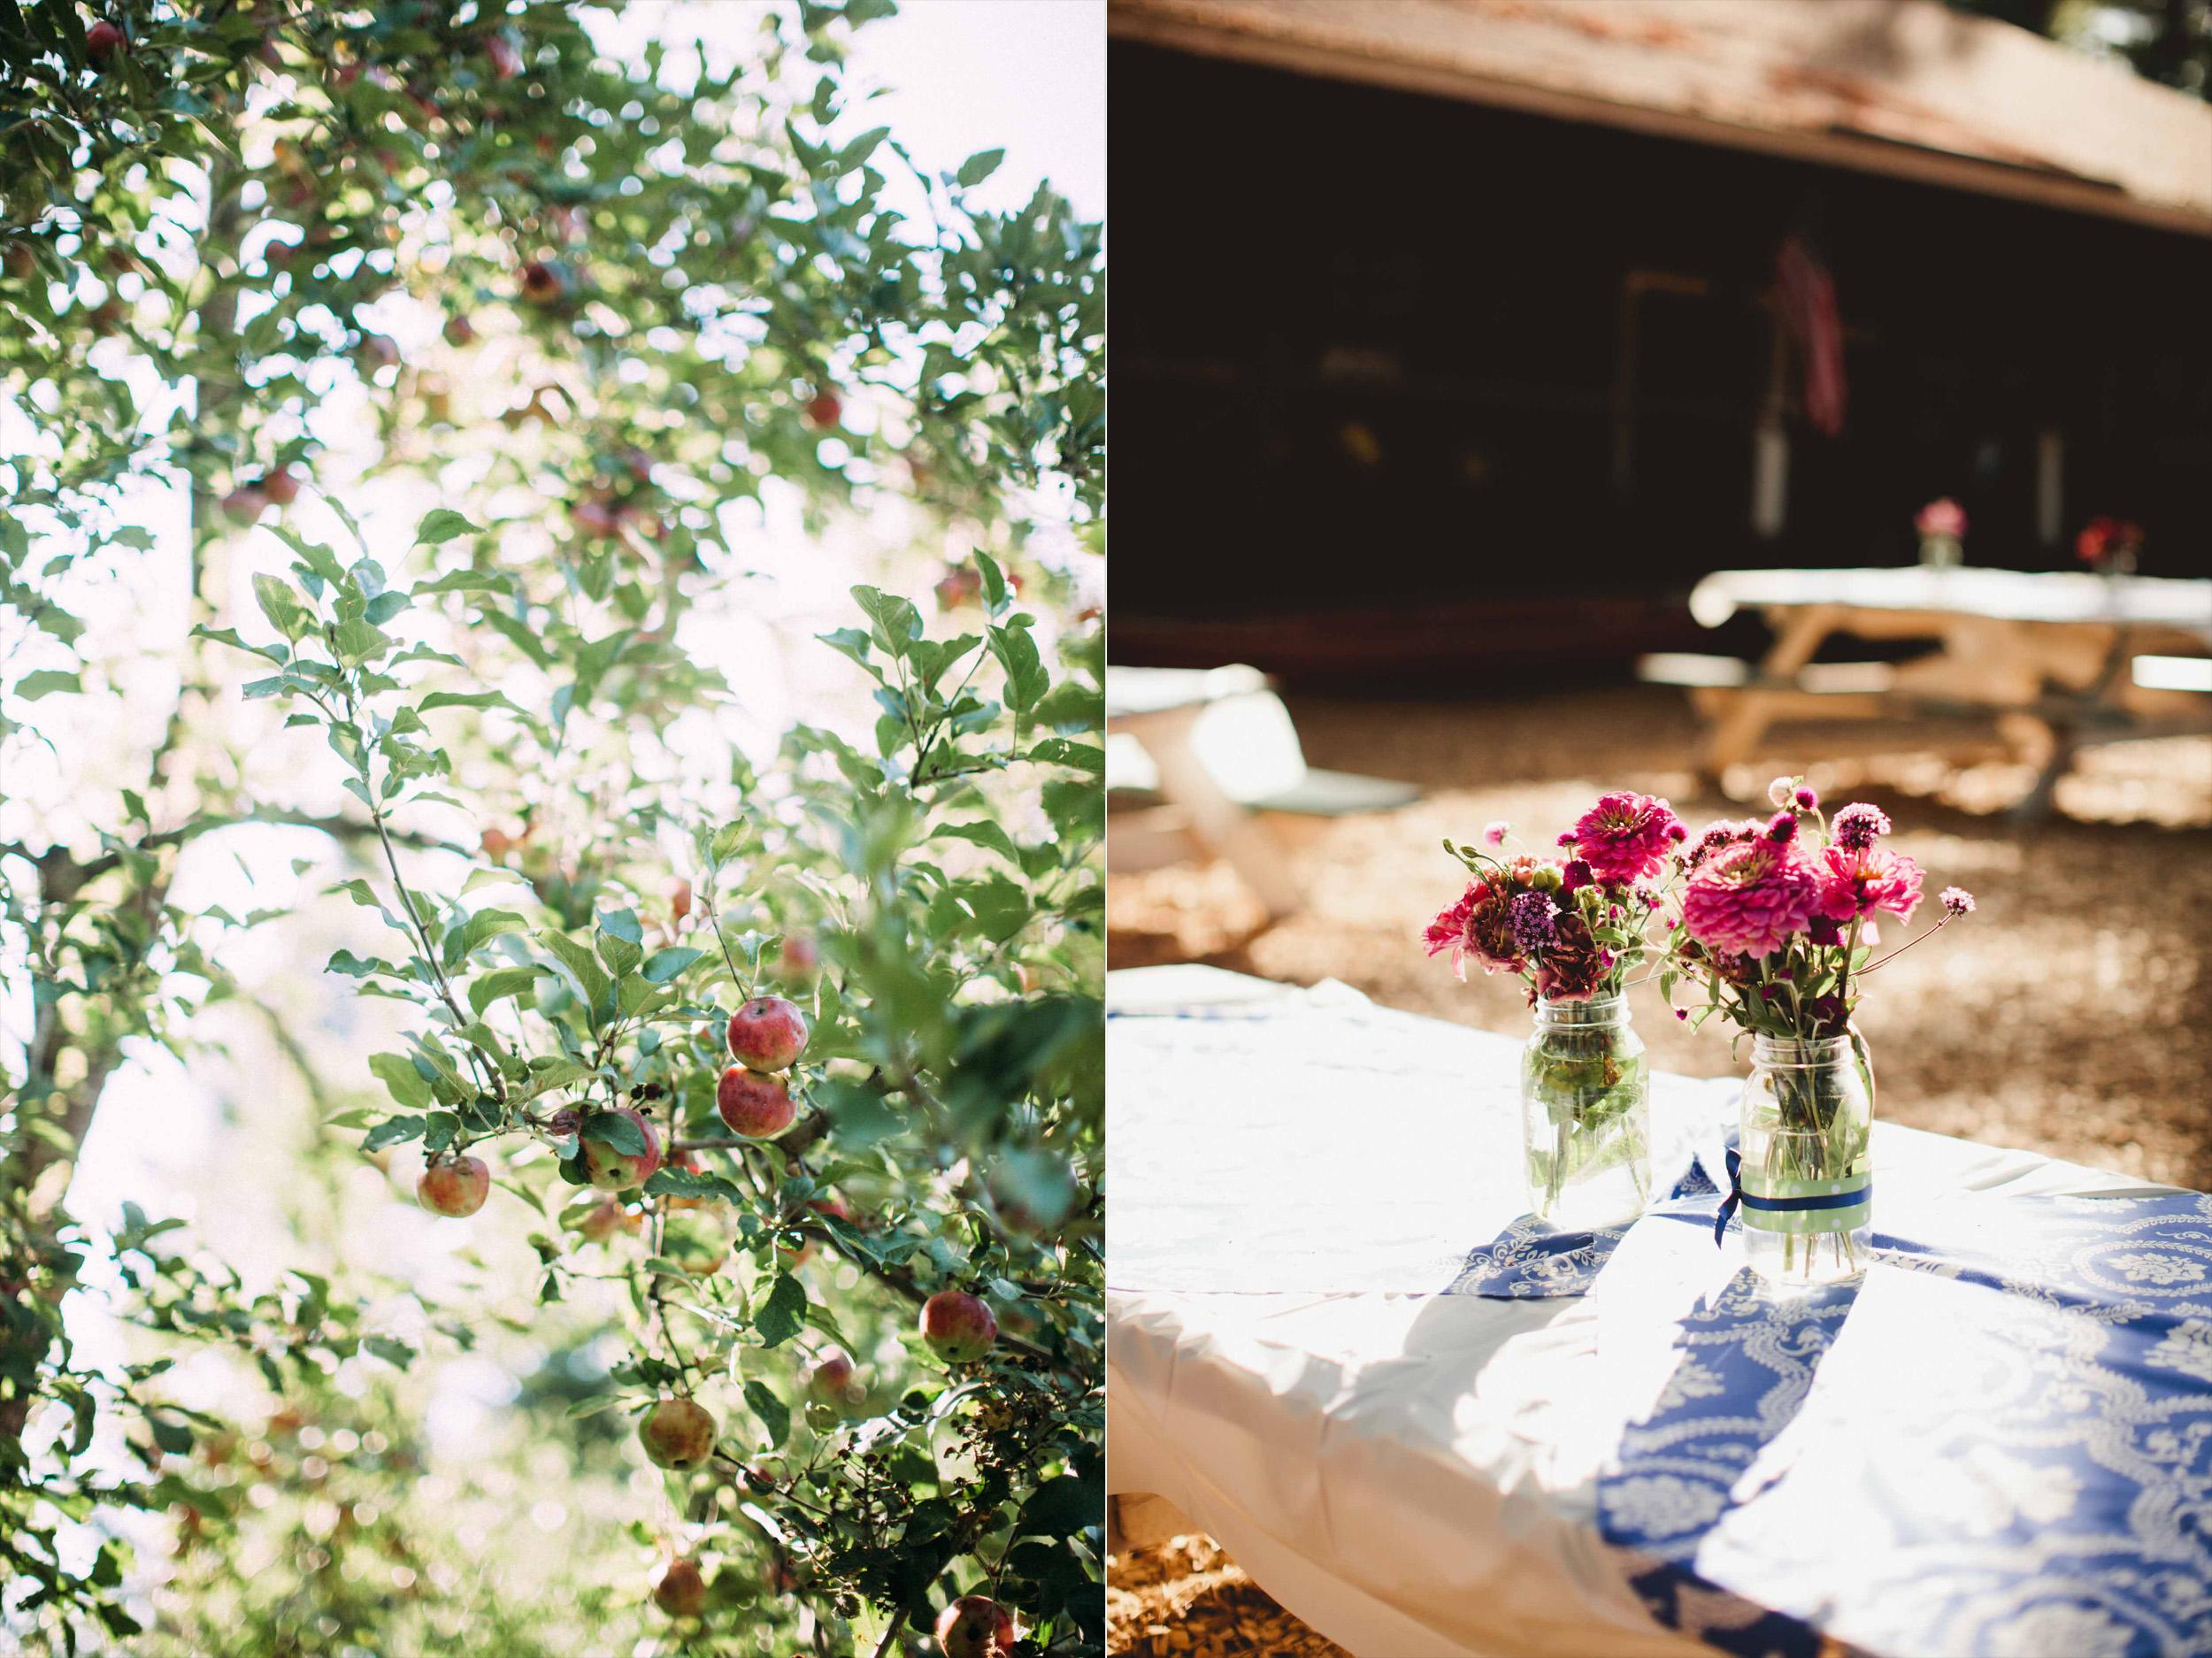 Summer-Camp-Wedding-1.jpg